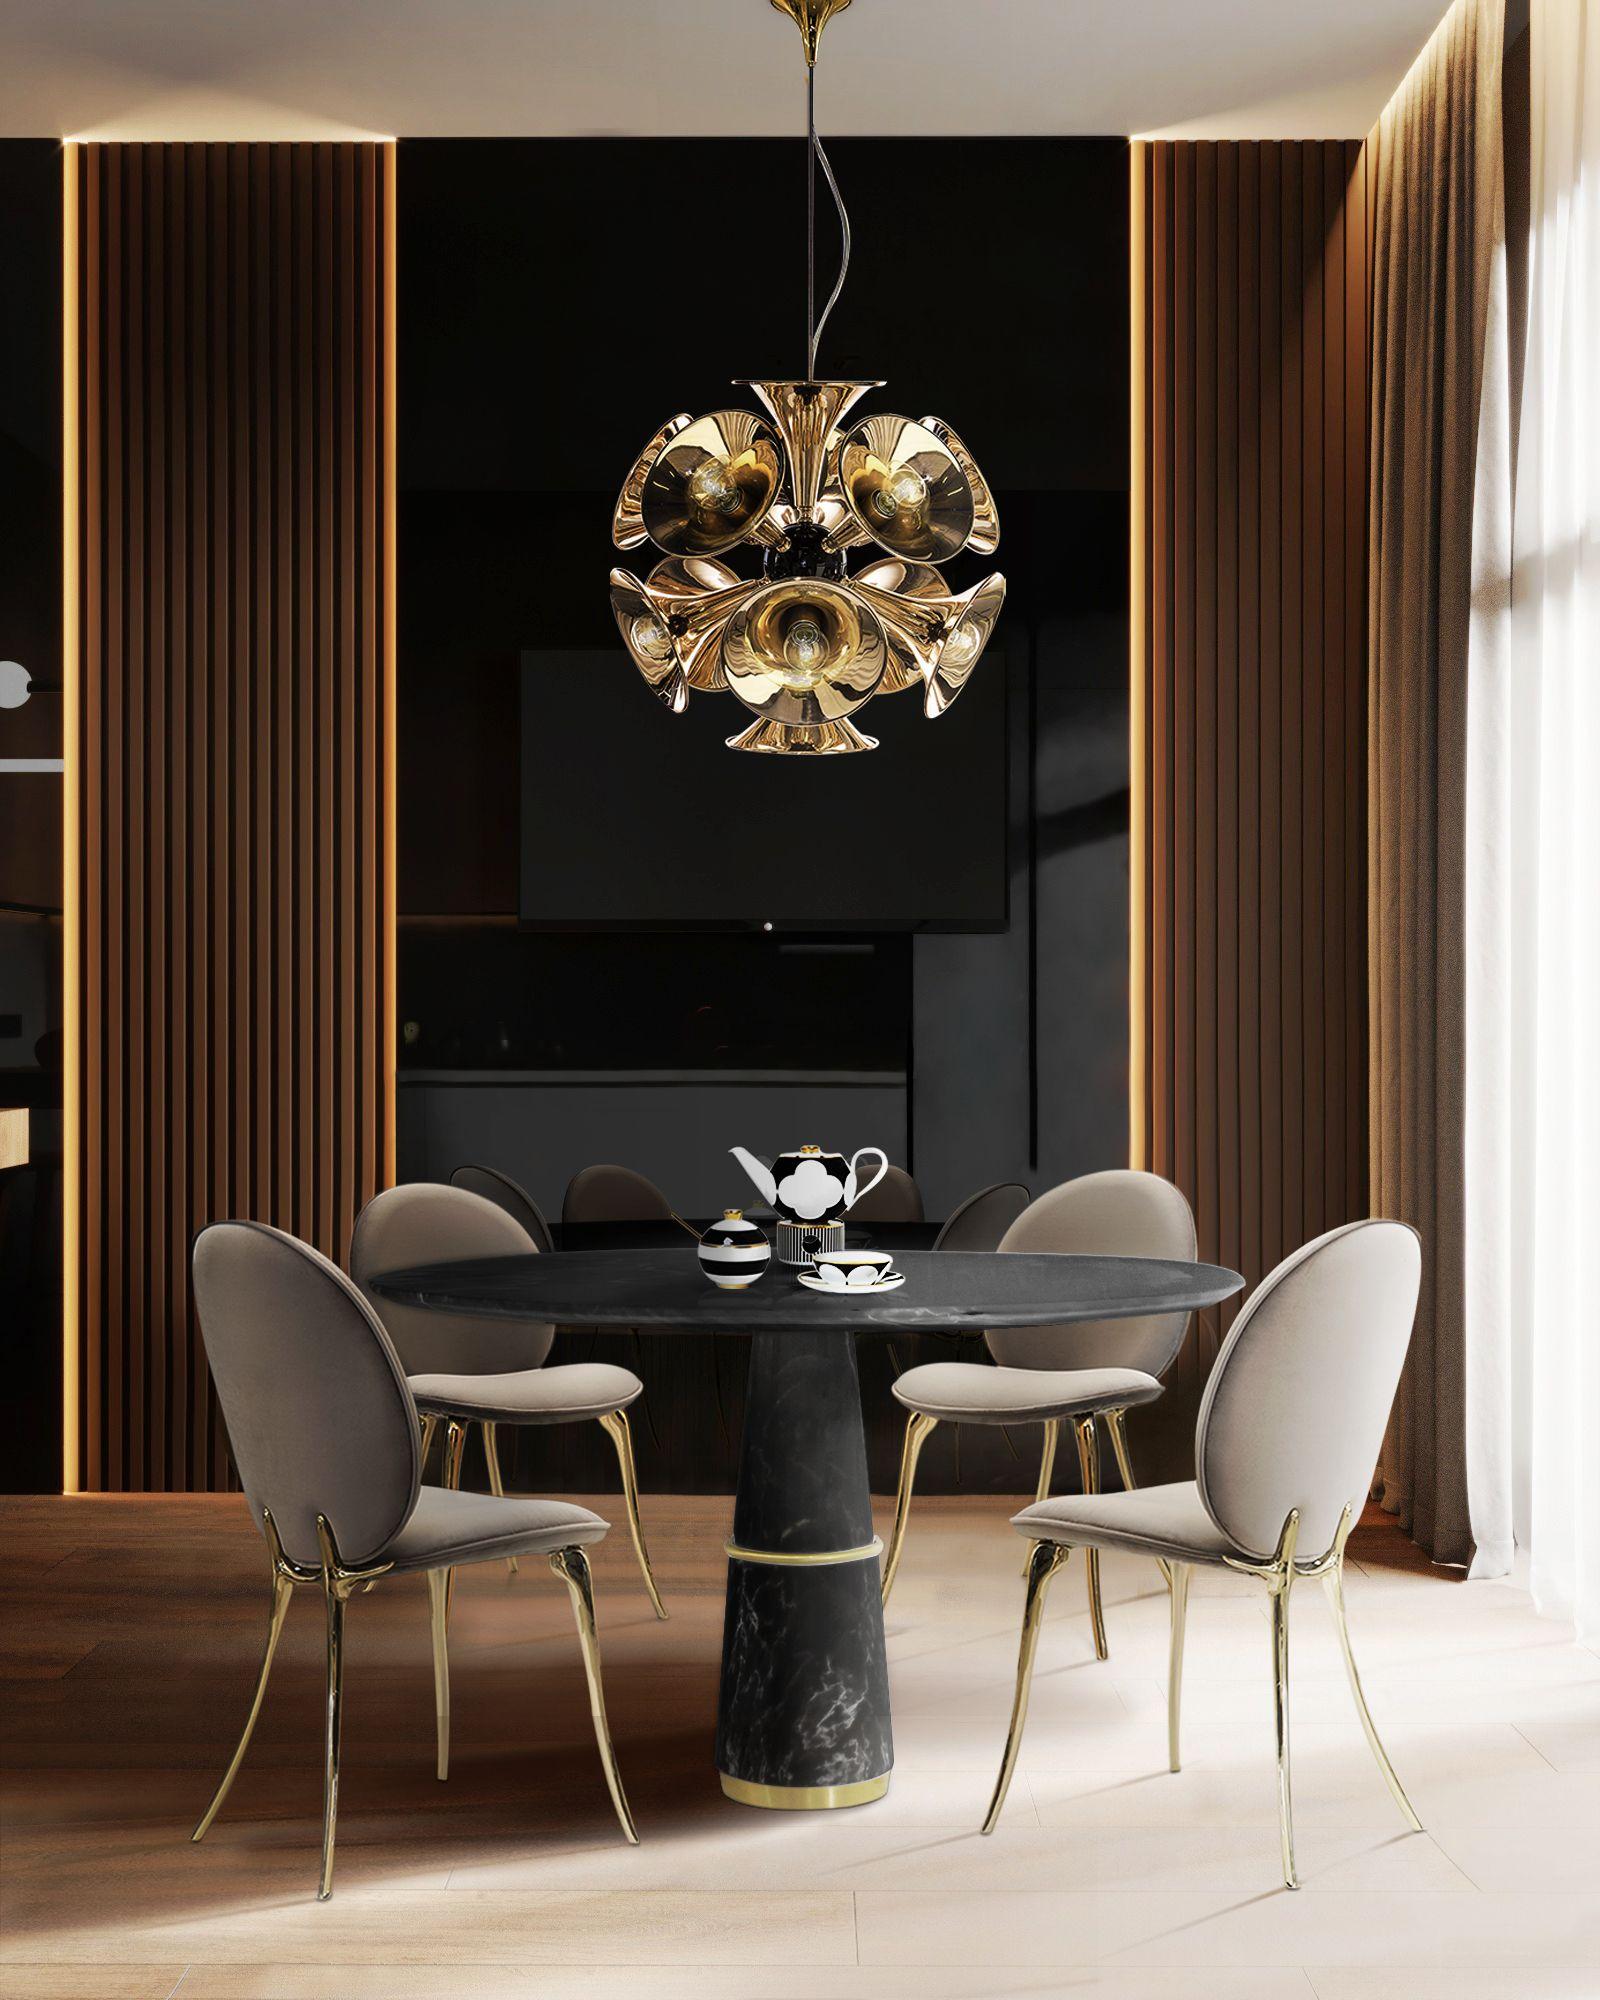 Trendy Lighting Designs For 2020 In 2020 Luxury Dining Room Luxury Dining Tables Dining Room Decor